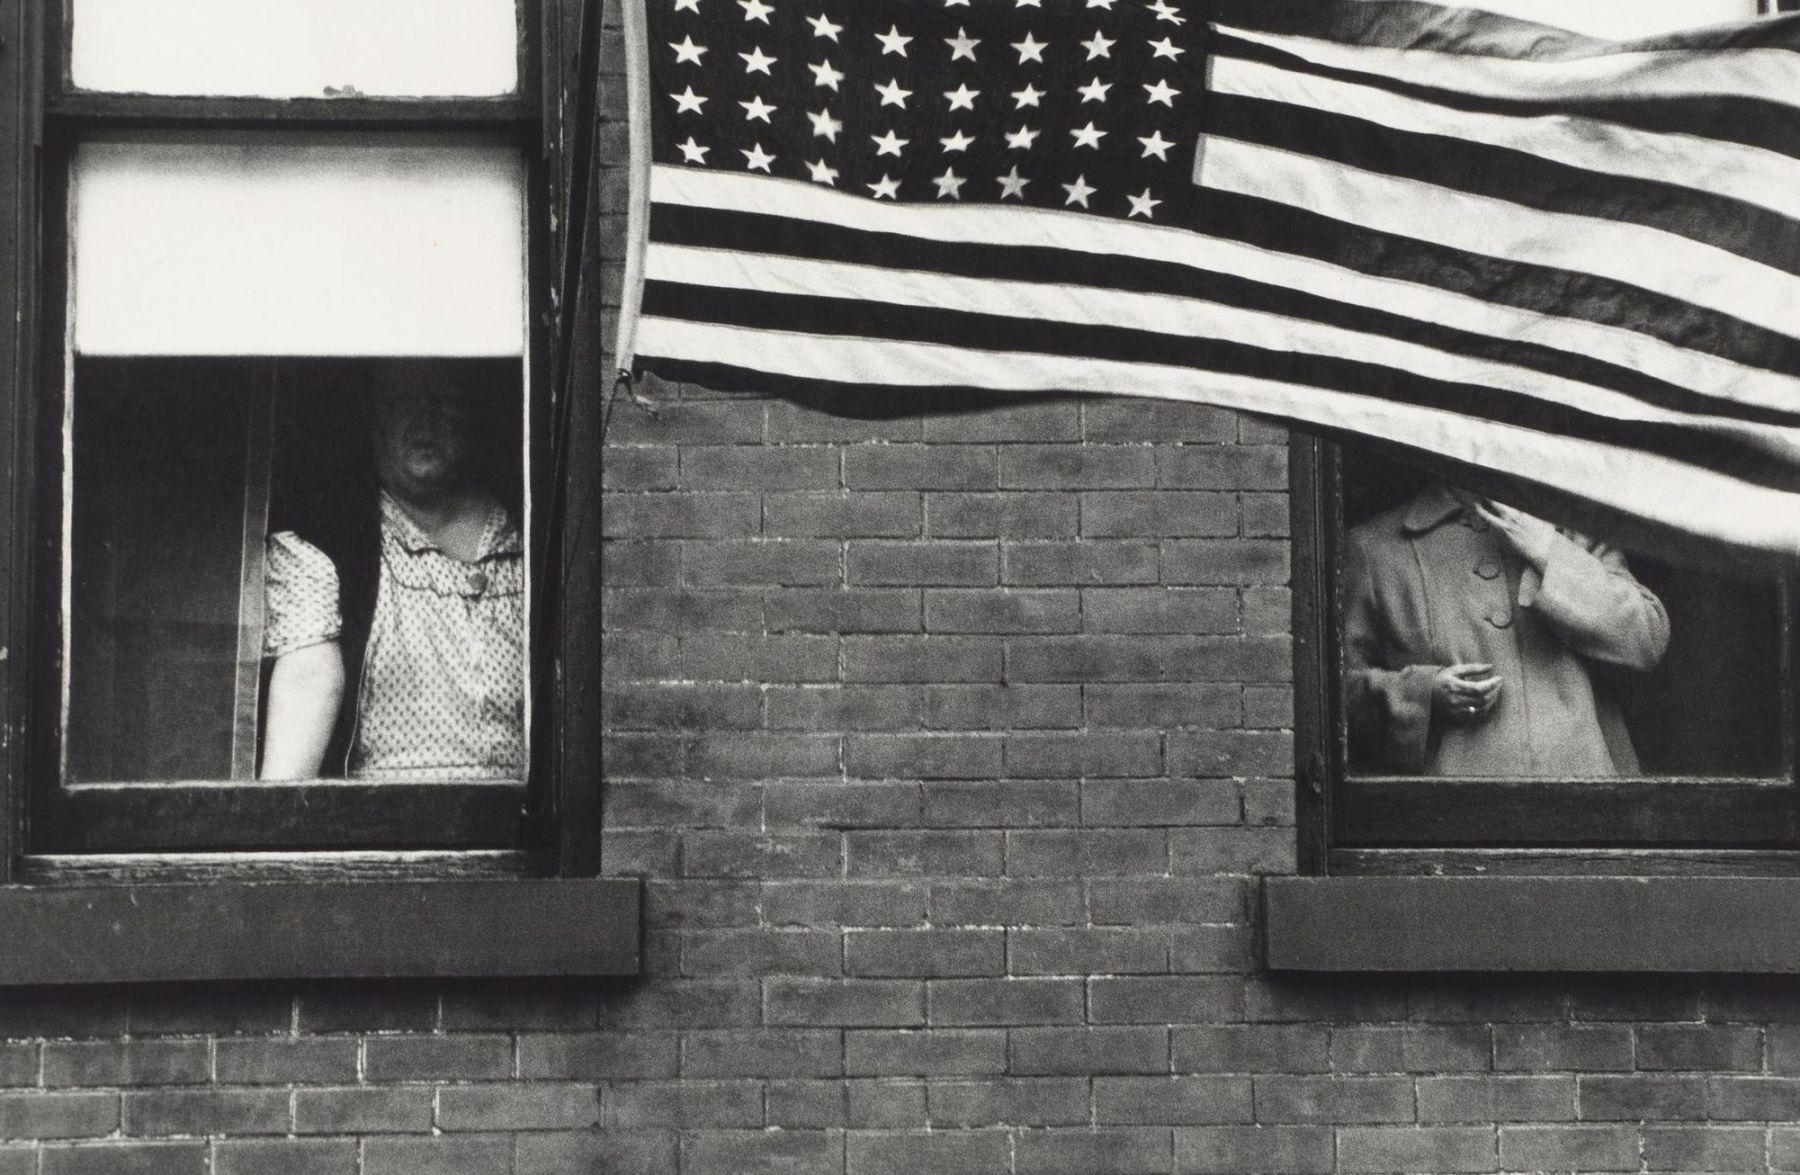 Robert Frank: Parade – Hoboken, New Jersey, 1955.